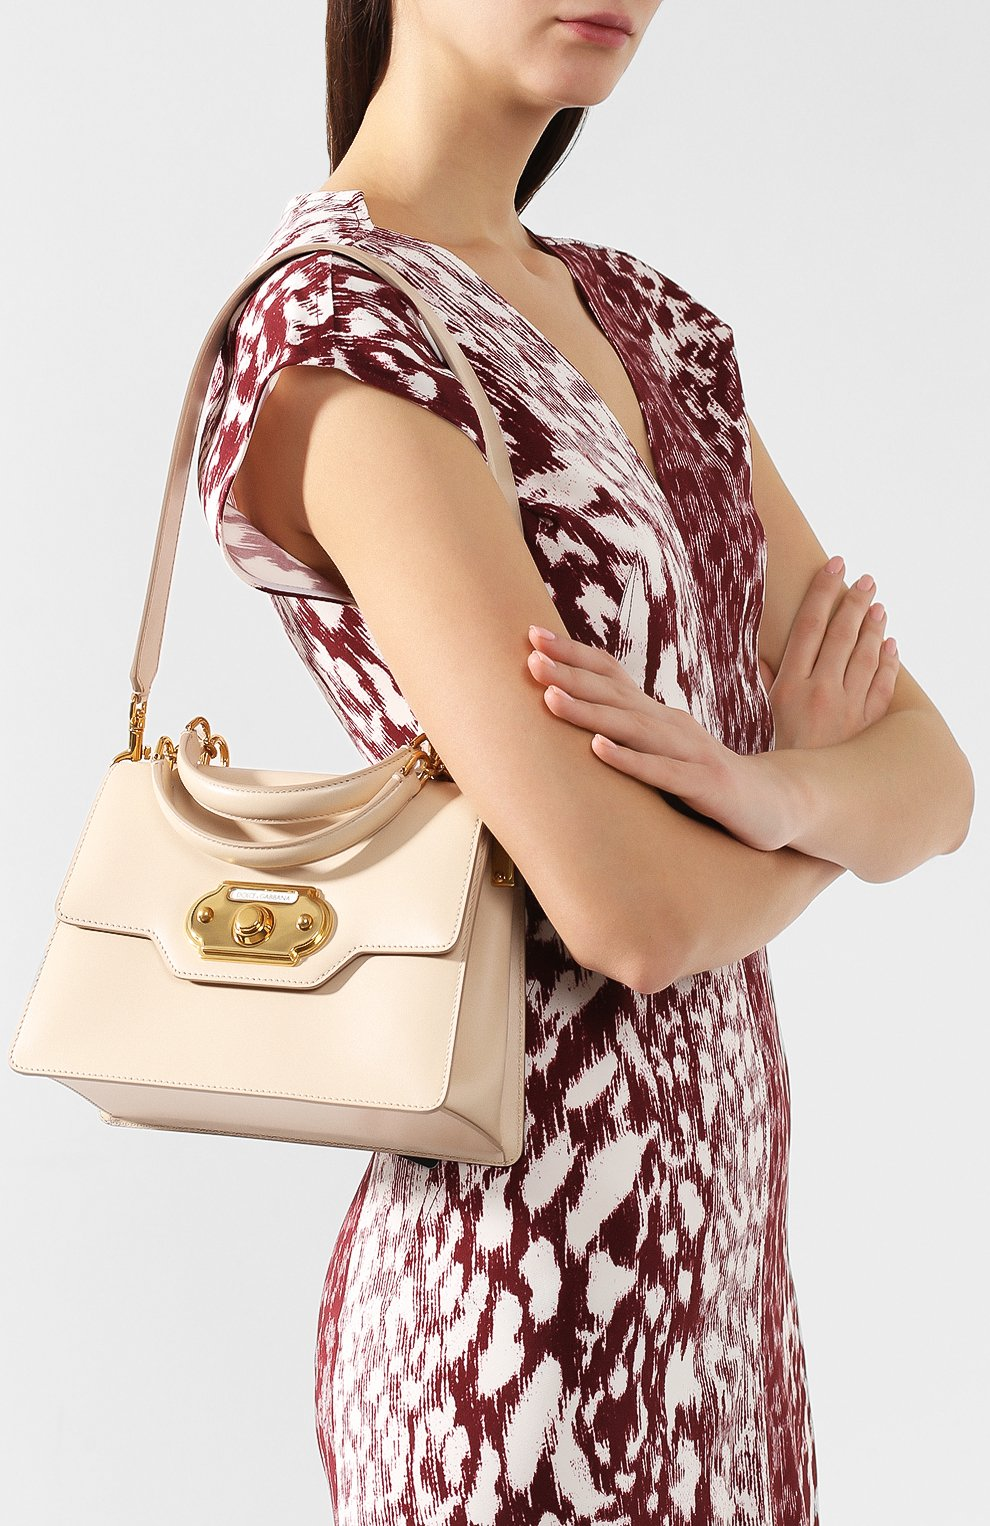 Сумка Welcome Dolce & Gabbana  светло-бежевая цвета | Фото №5